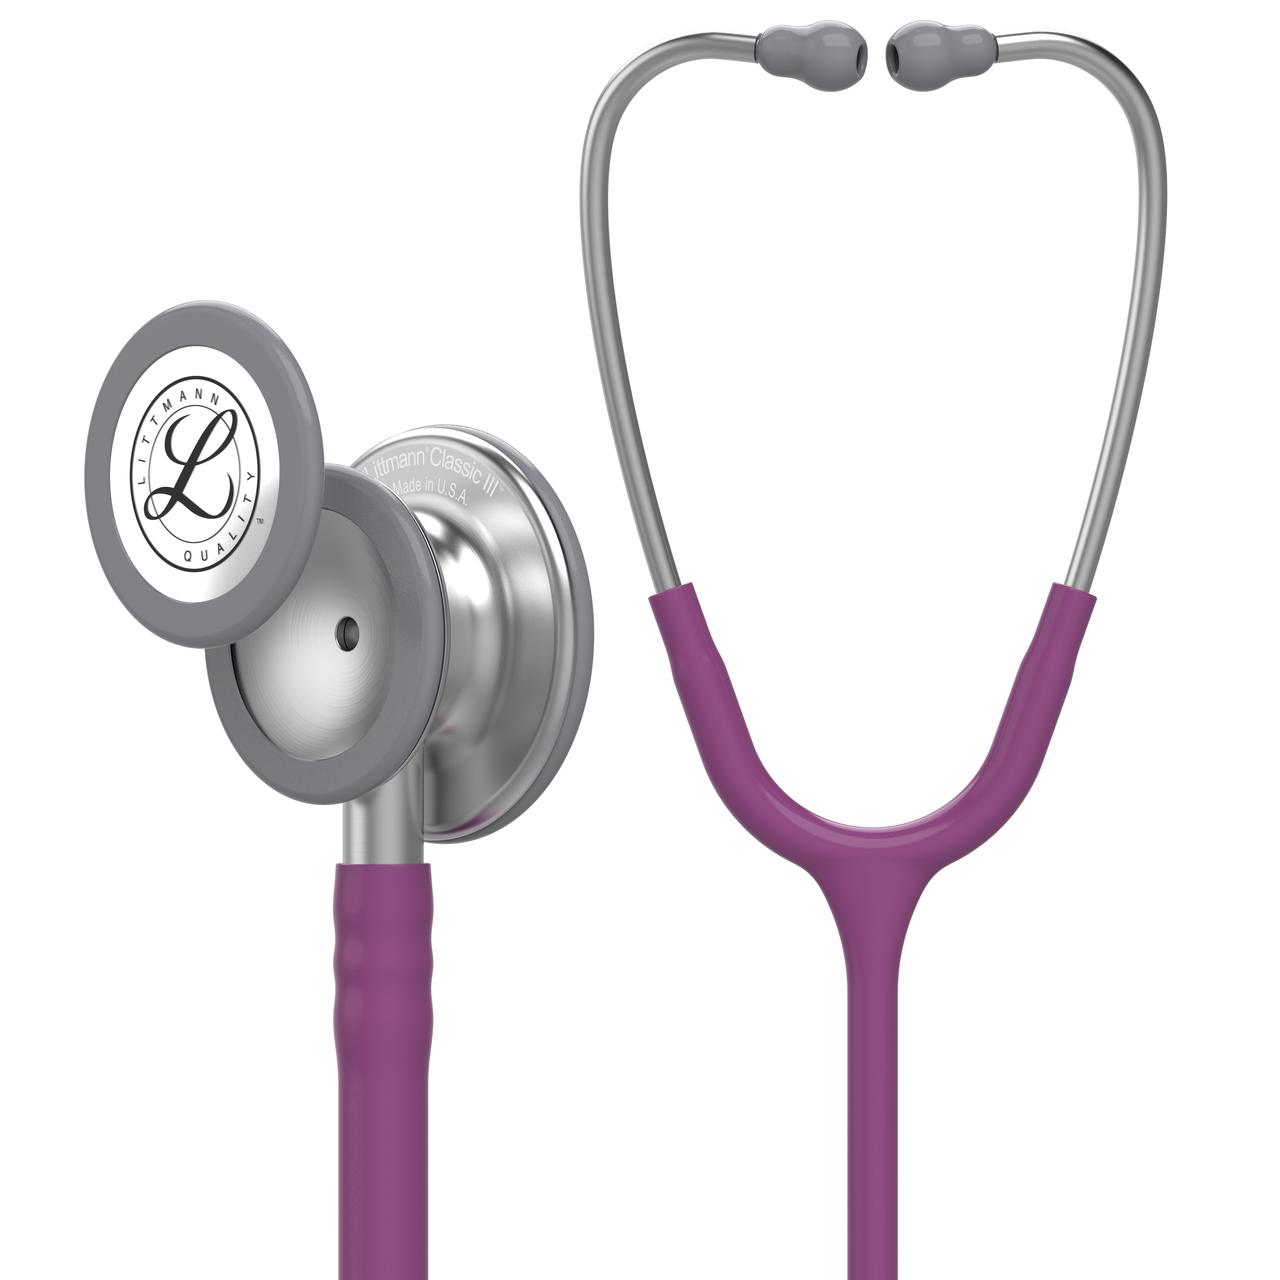 Littmann Classic III Stethoscope, Plum, 5831